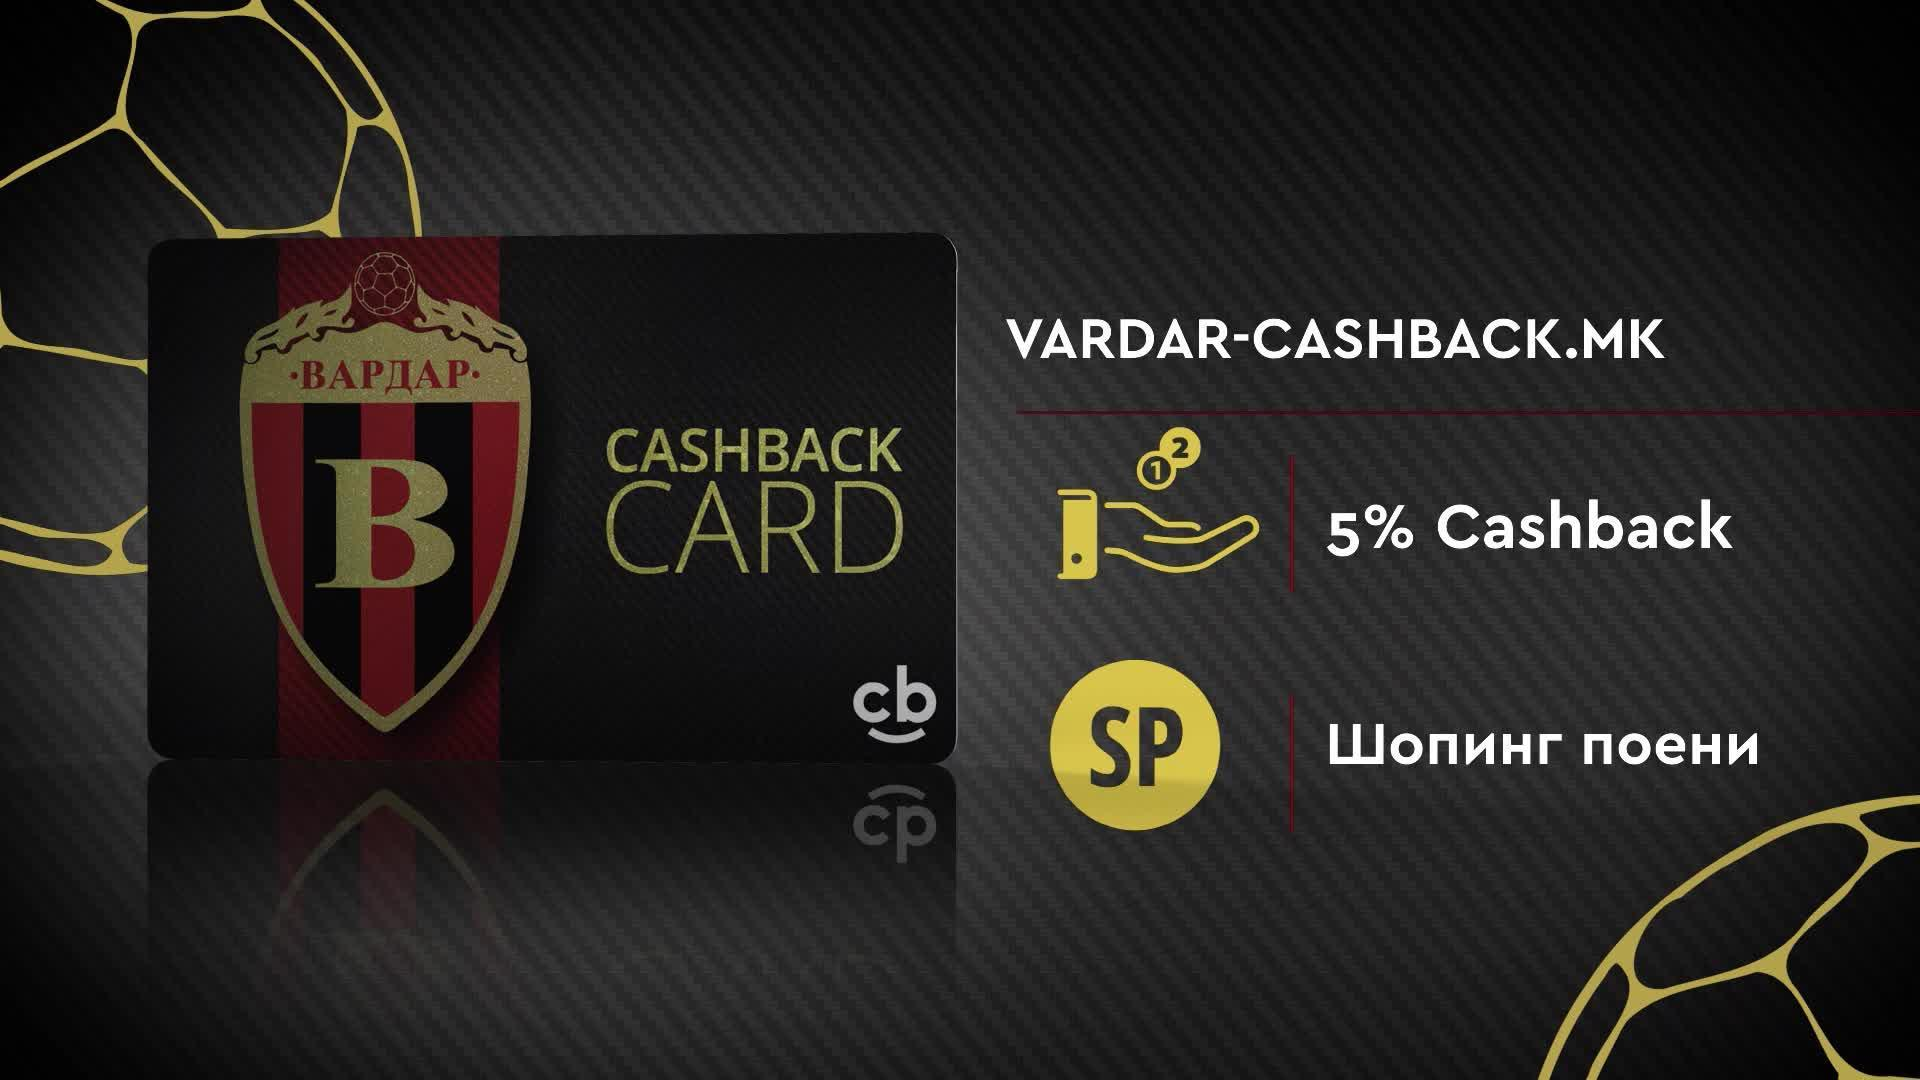 Vardar Cashback Card